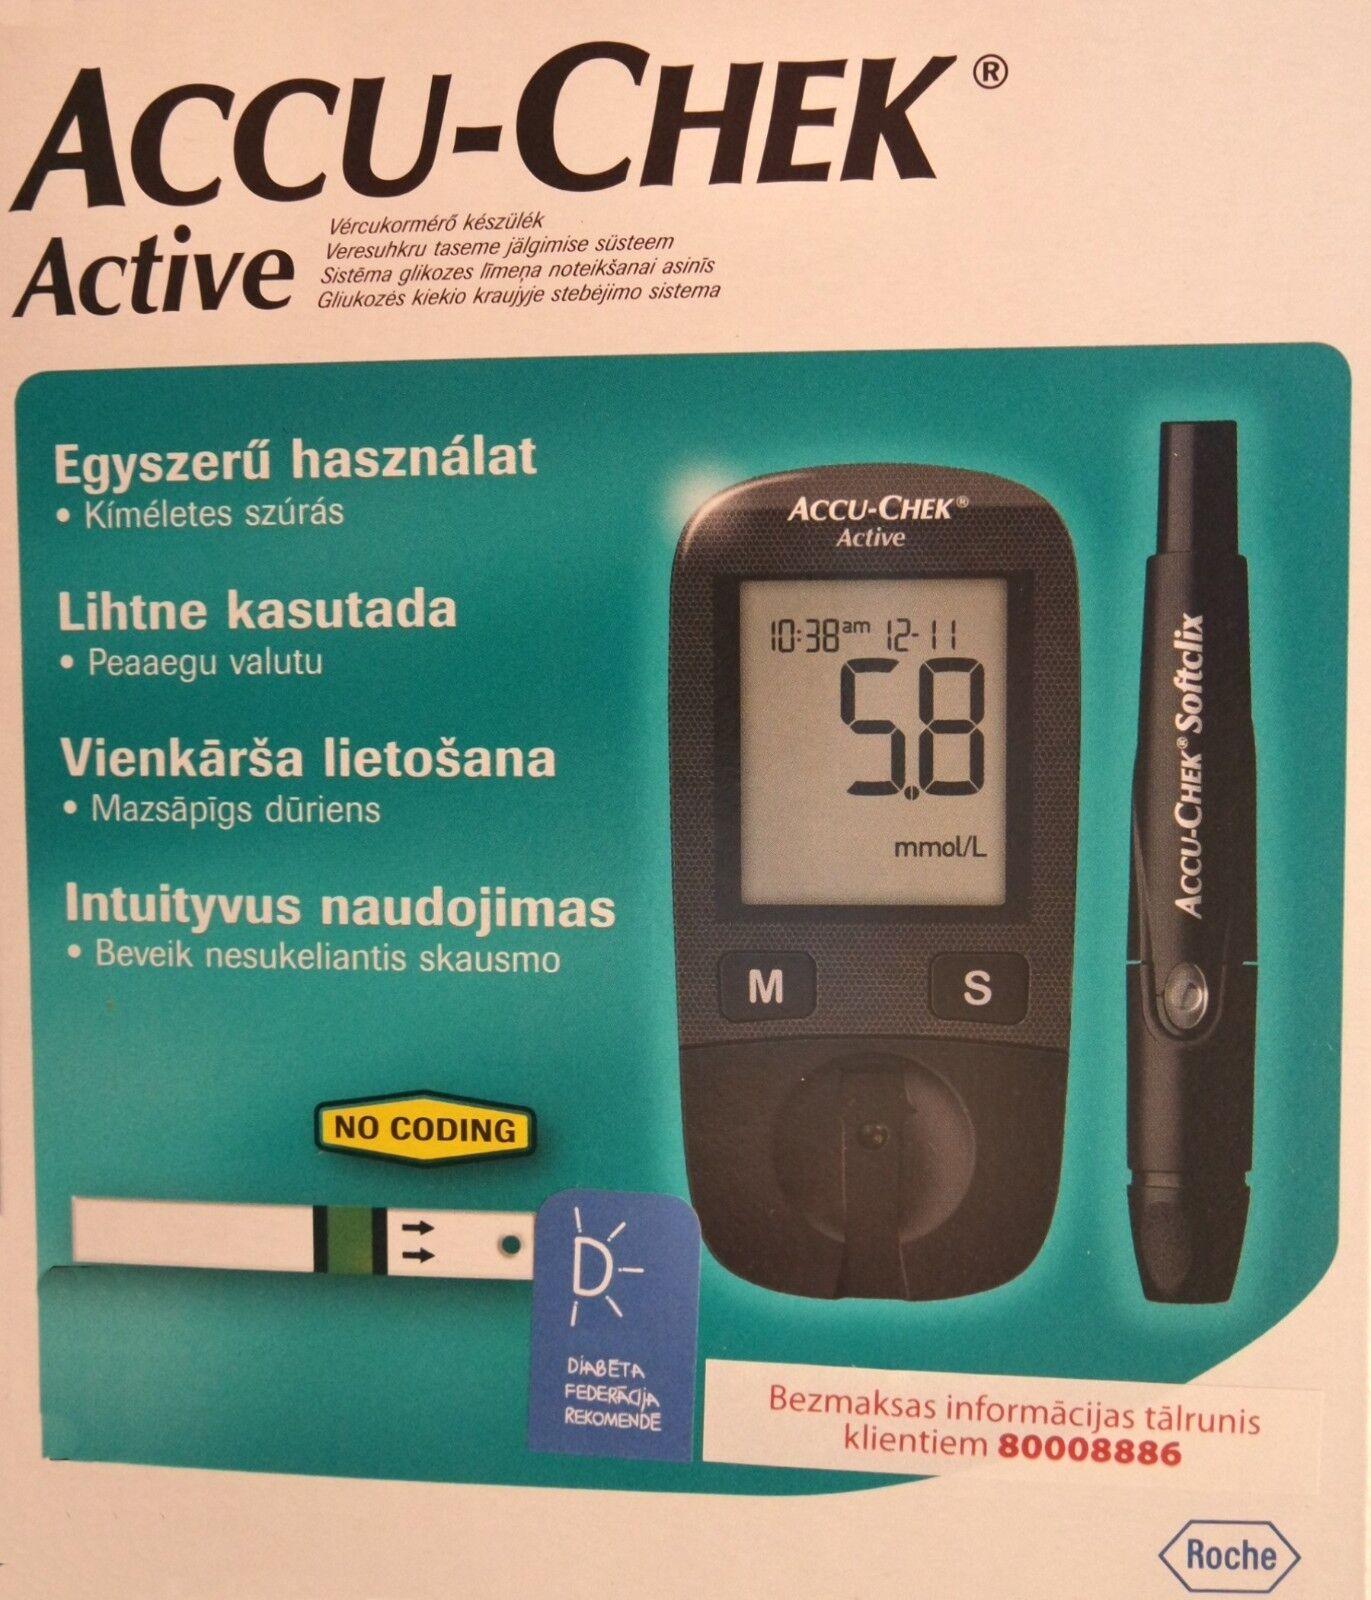 BlooD glucose Meter diabetic Accu-Chek Active mmol/L start k